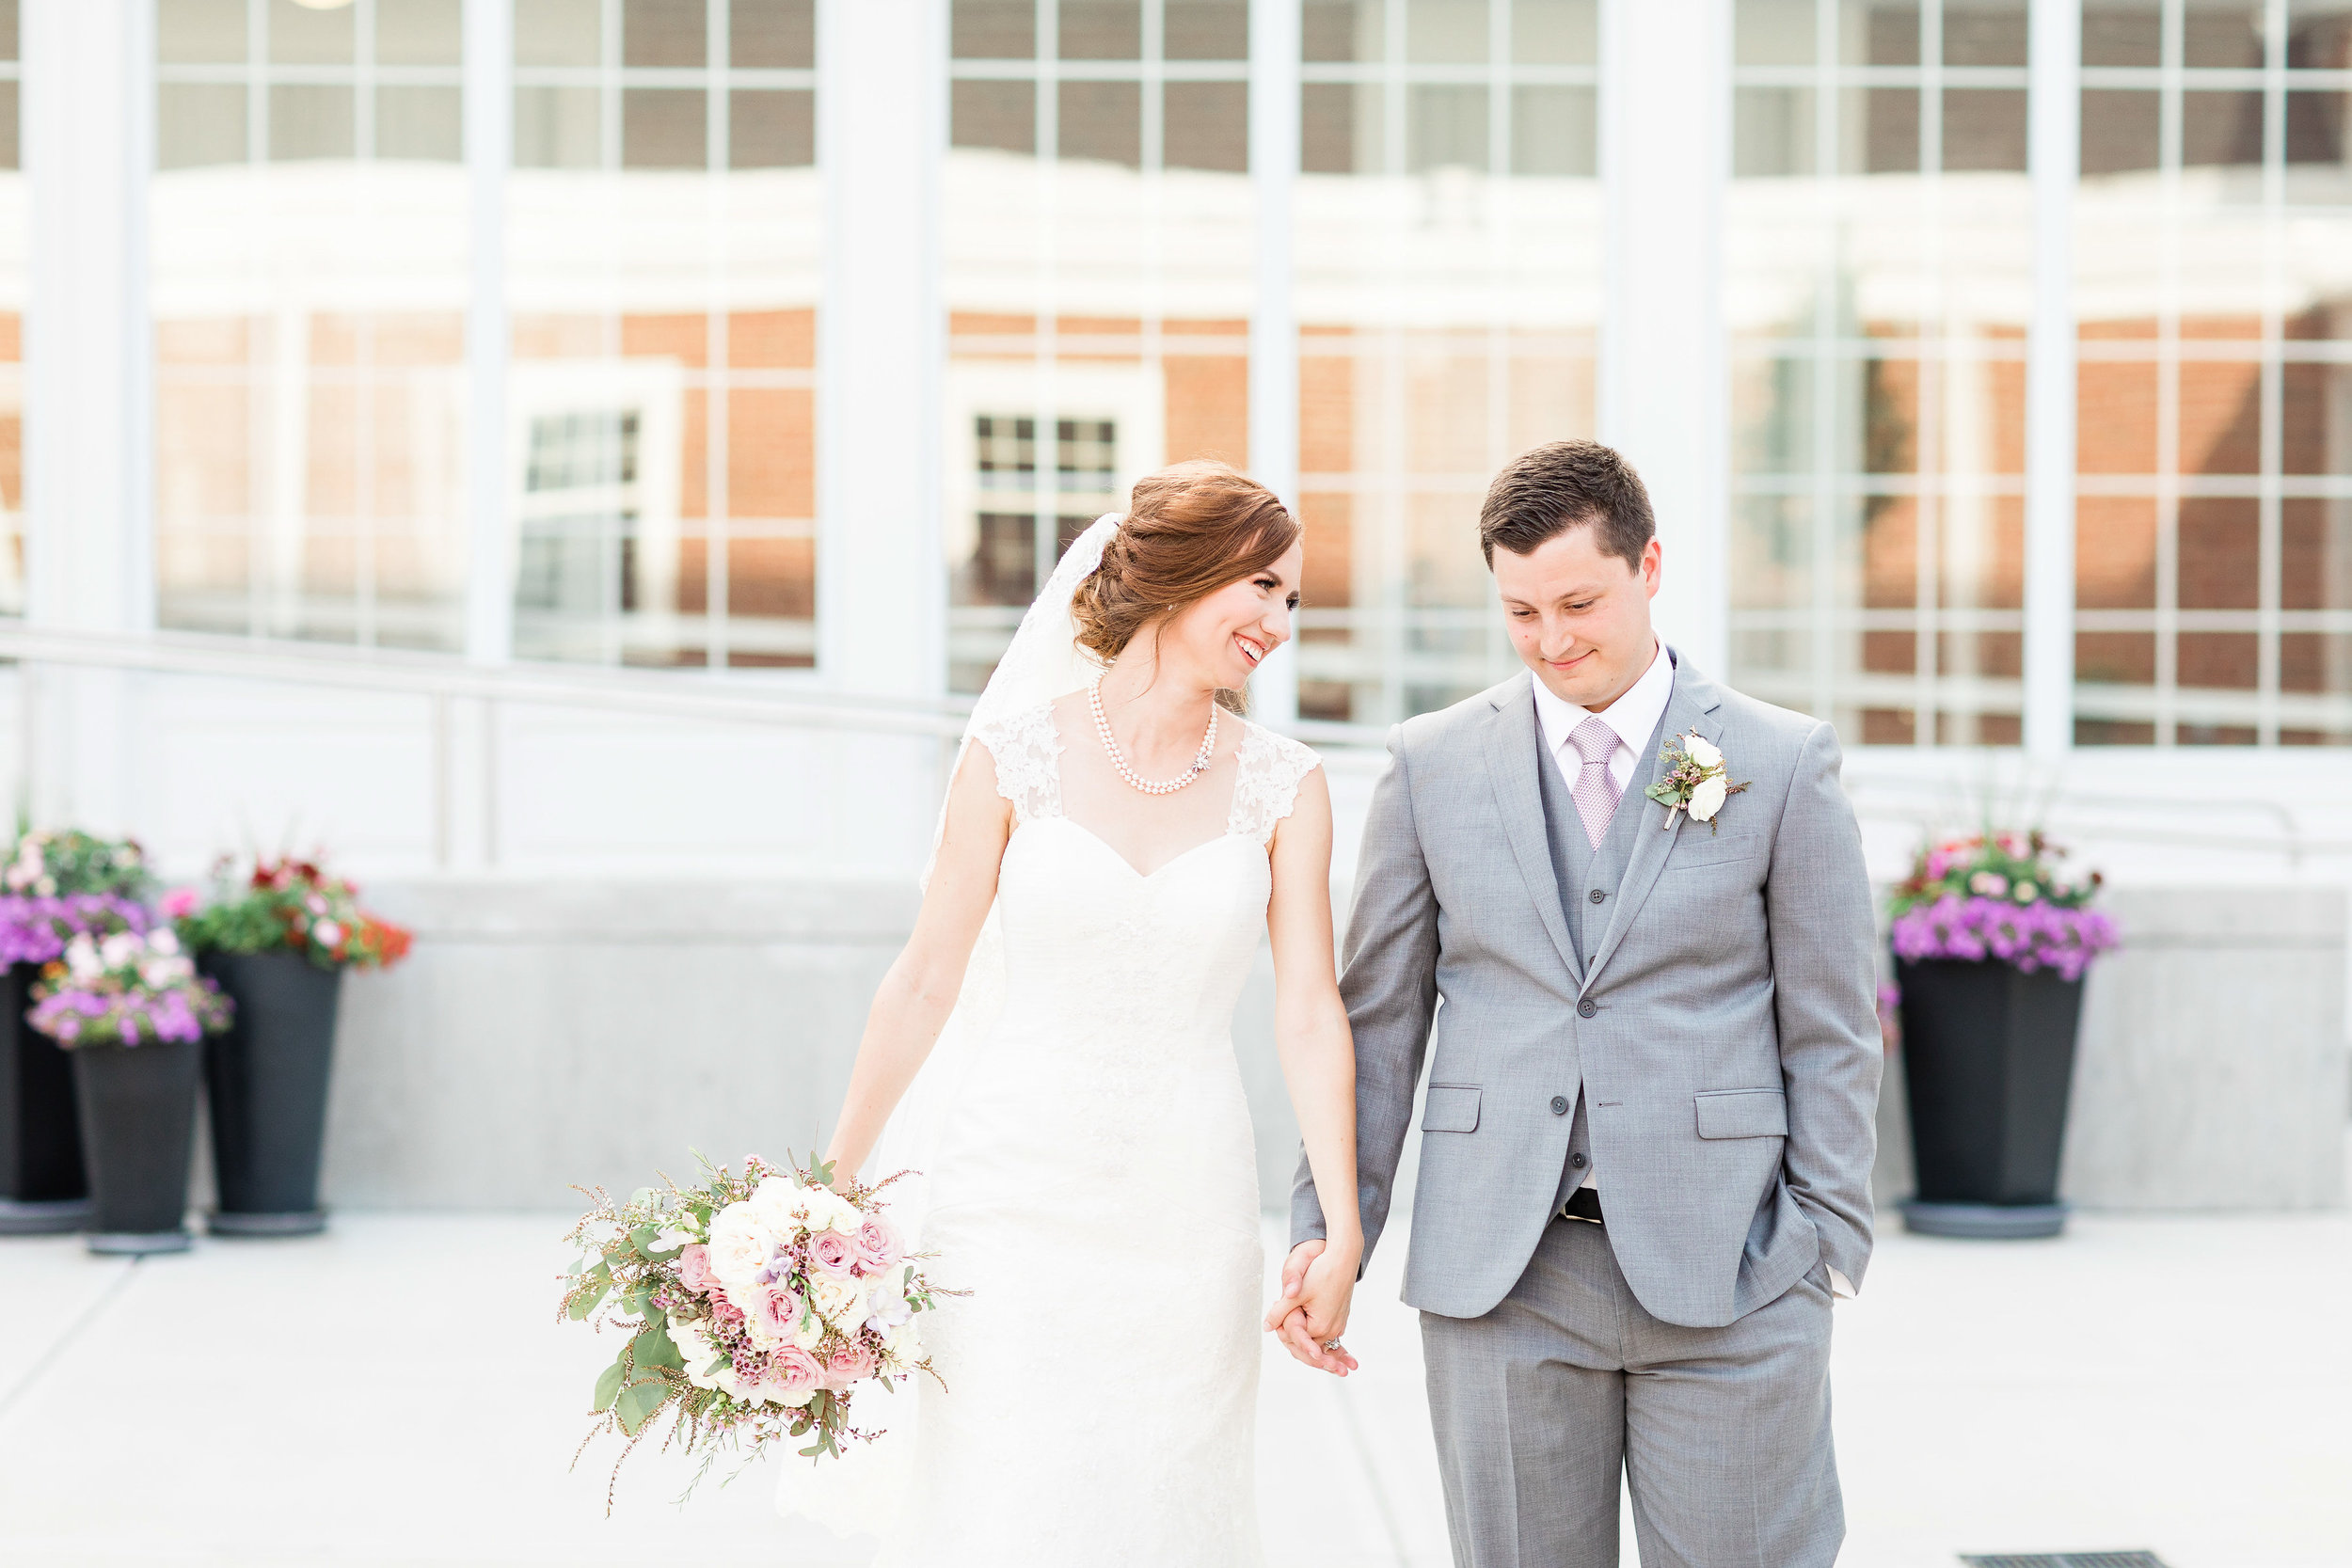 lauren day photography cincinnati wedding photographers -5.jpg